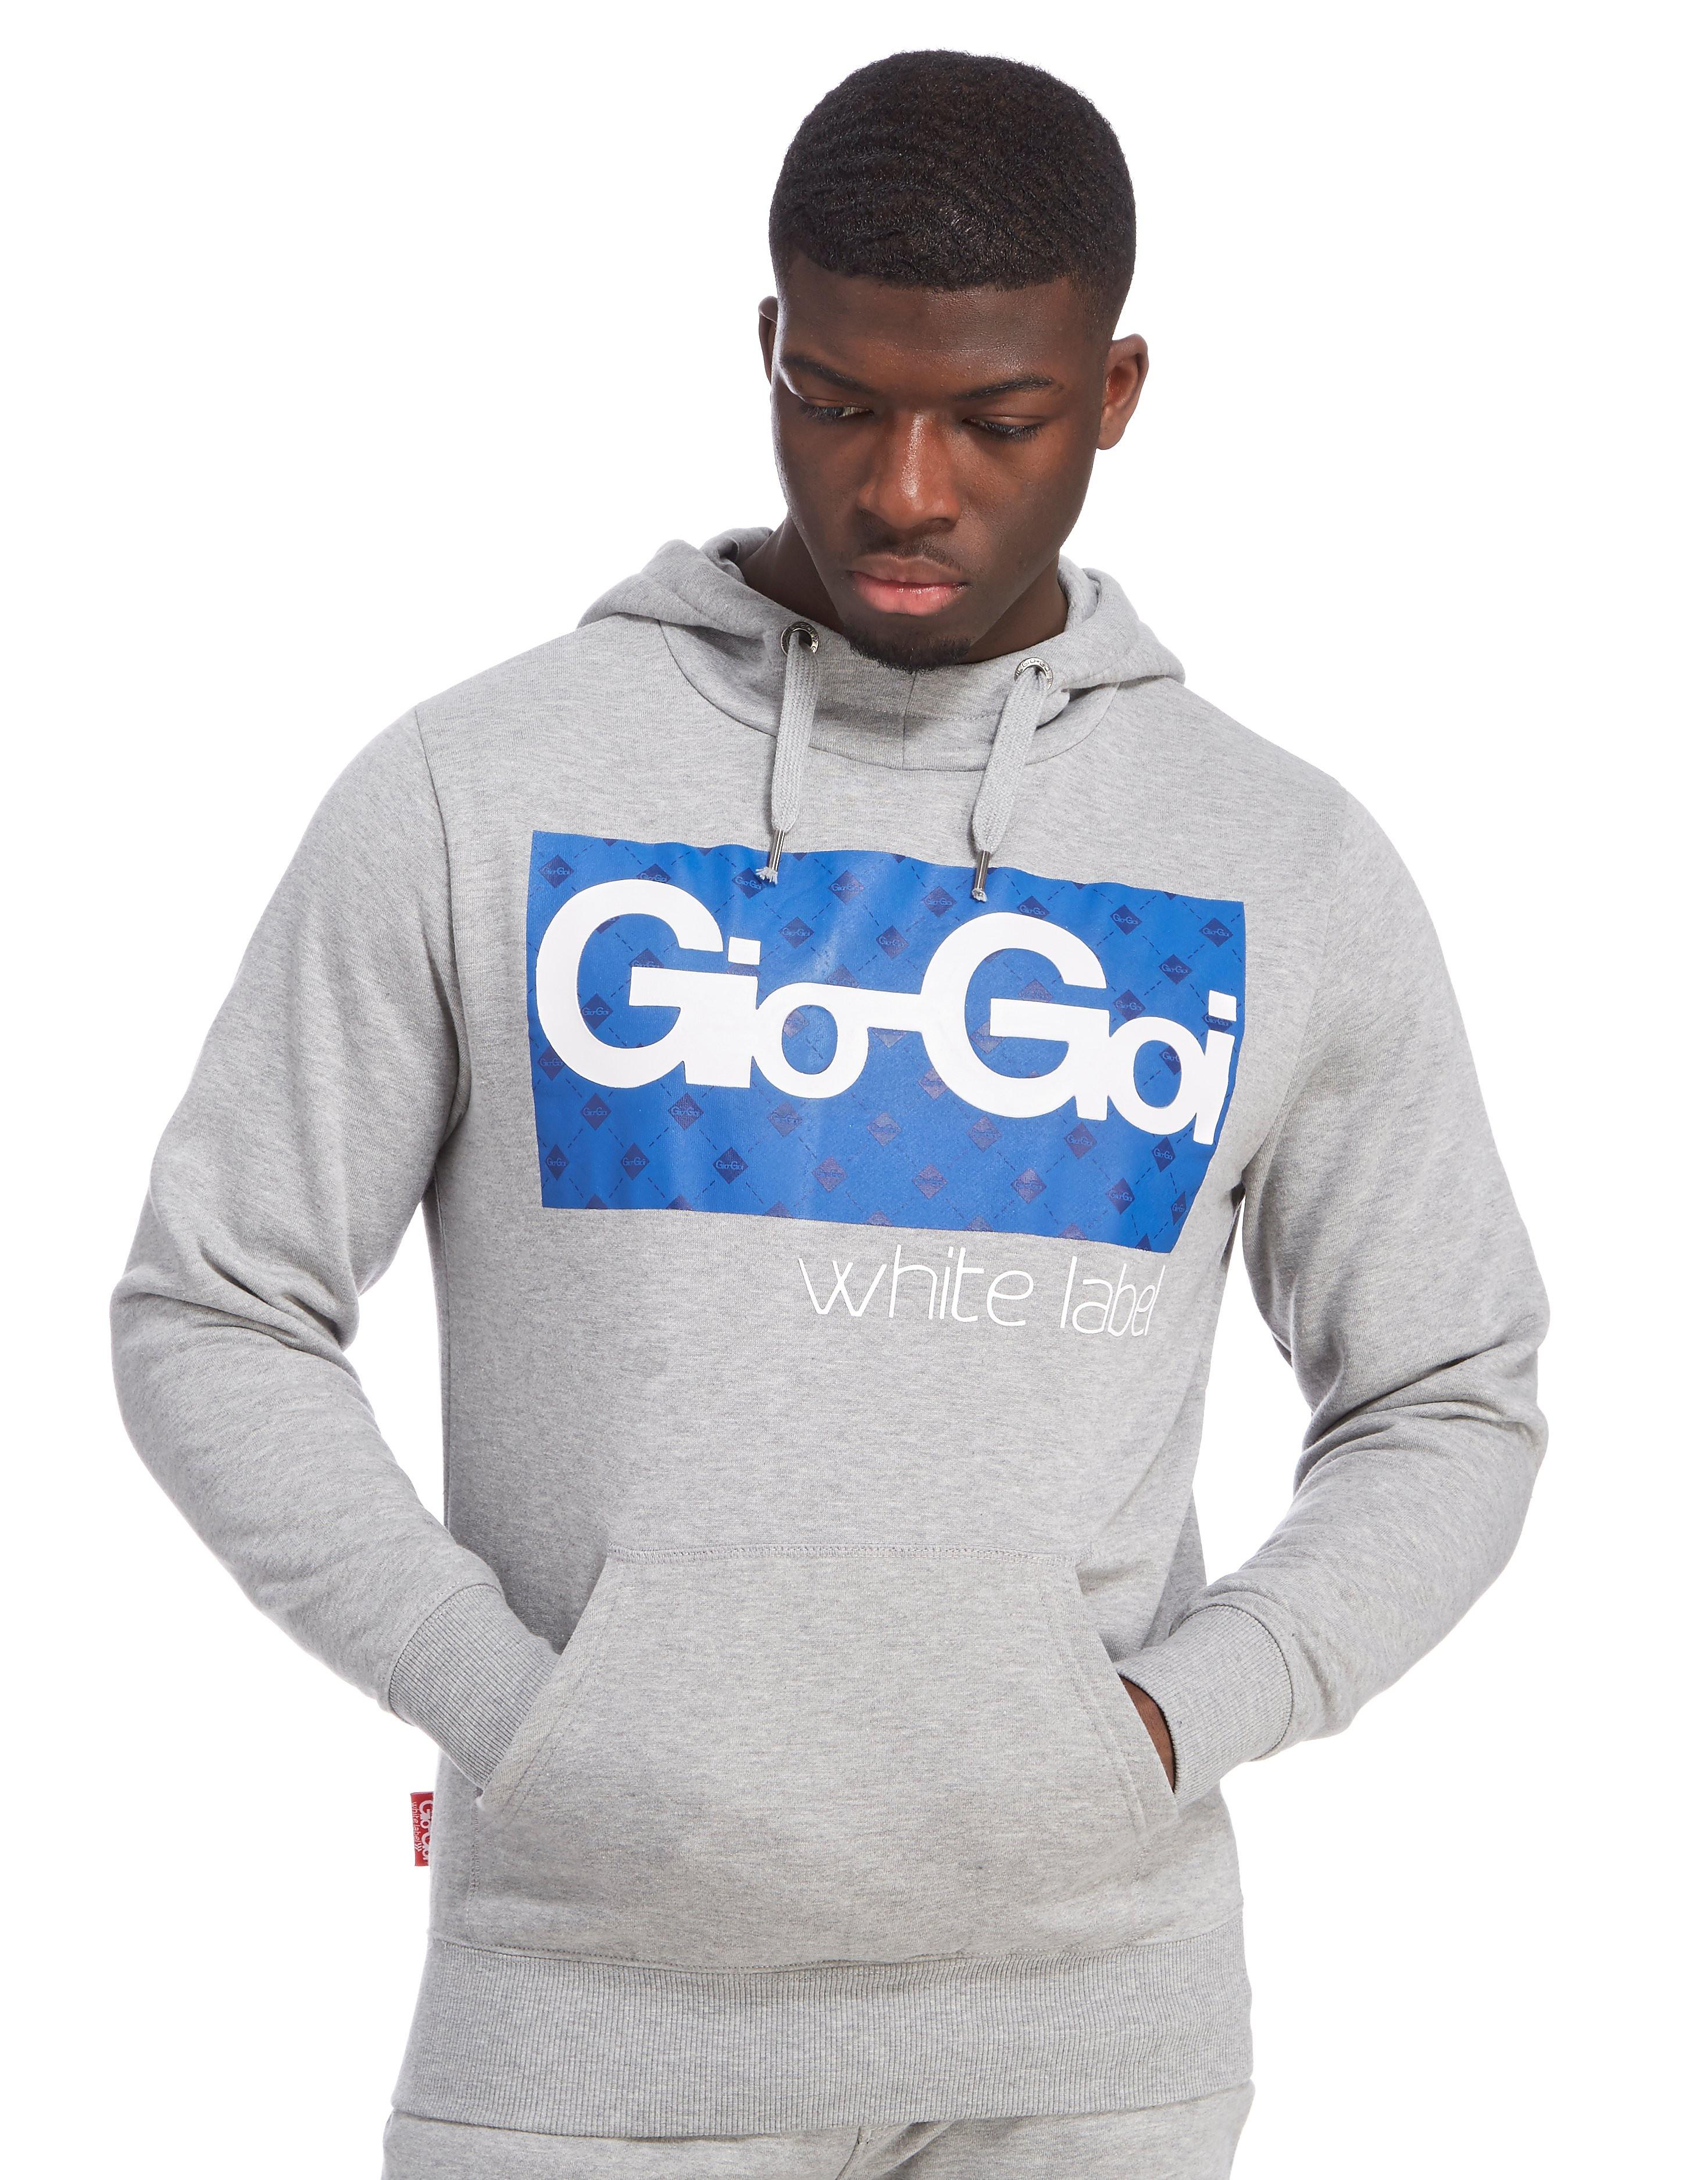 Gio-Goi Location Hoody